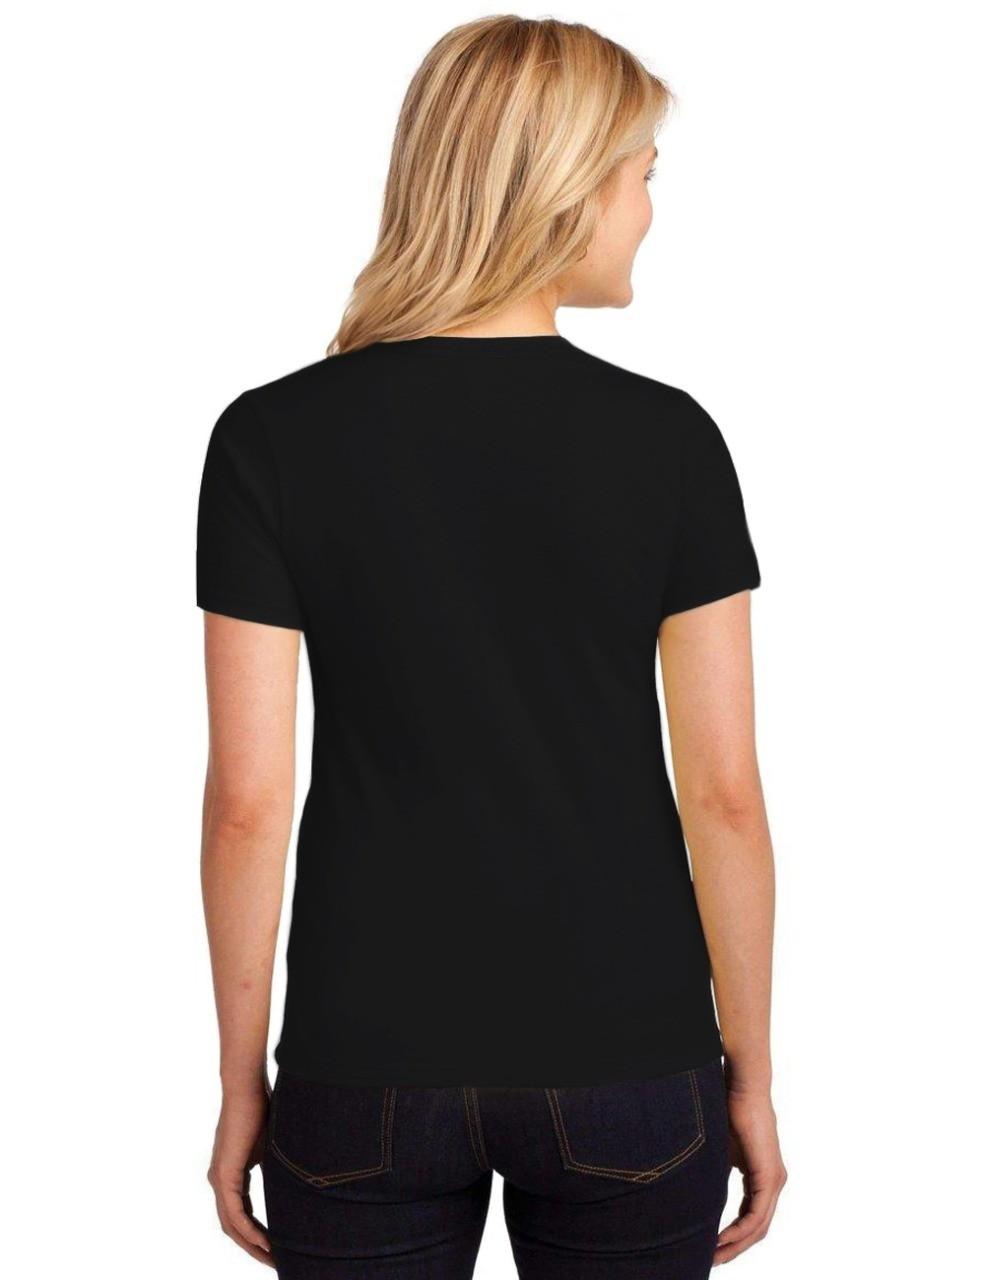 Camiseta Feminina T-Shirt Full Printed Nasa Nerd Geek Baby Look FP_028